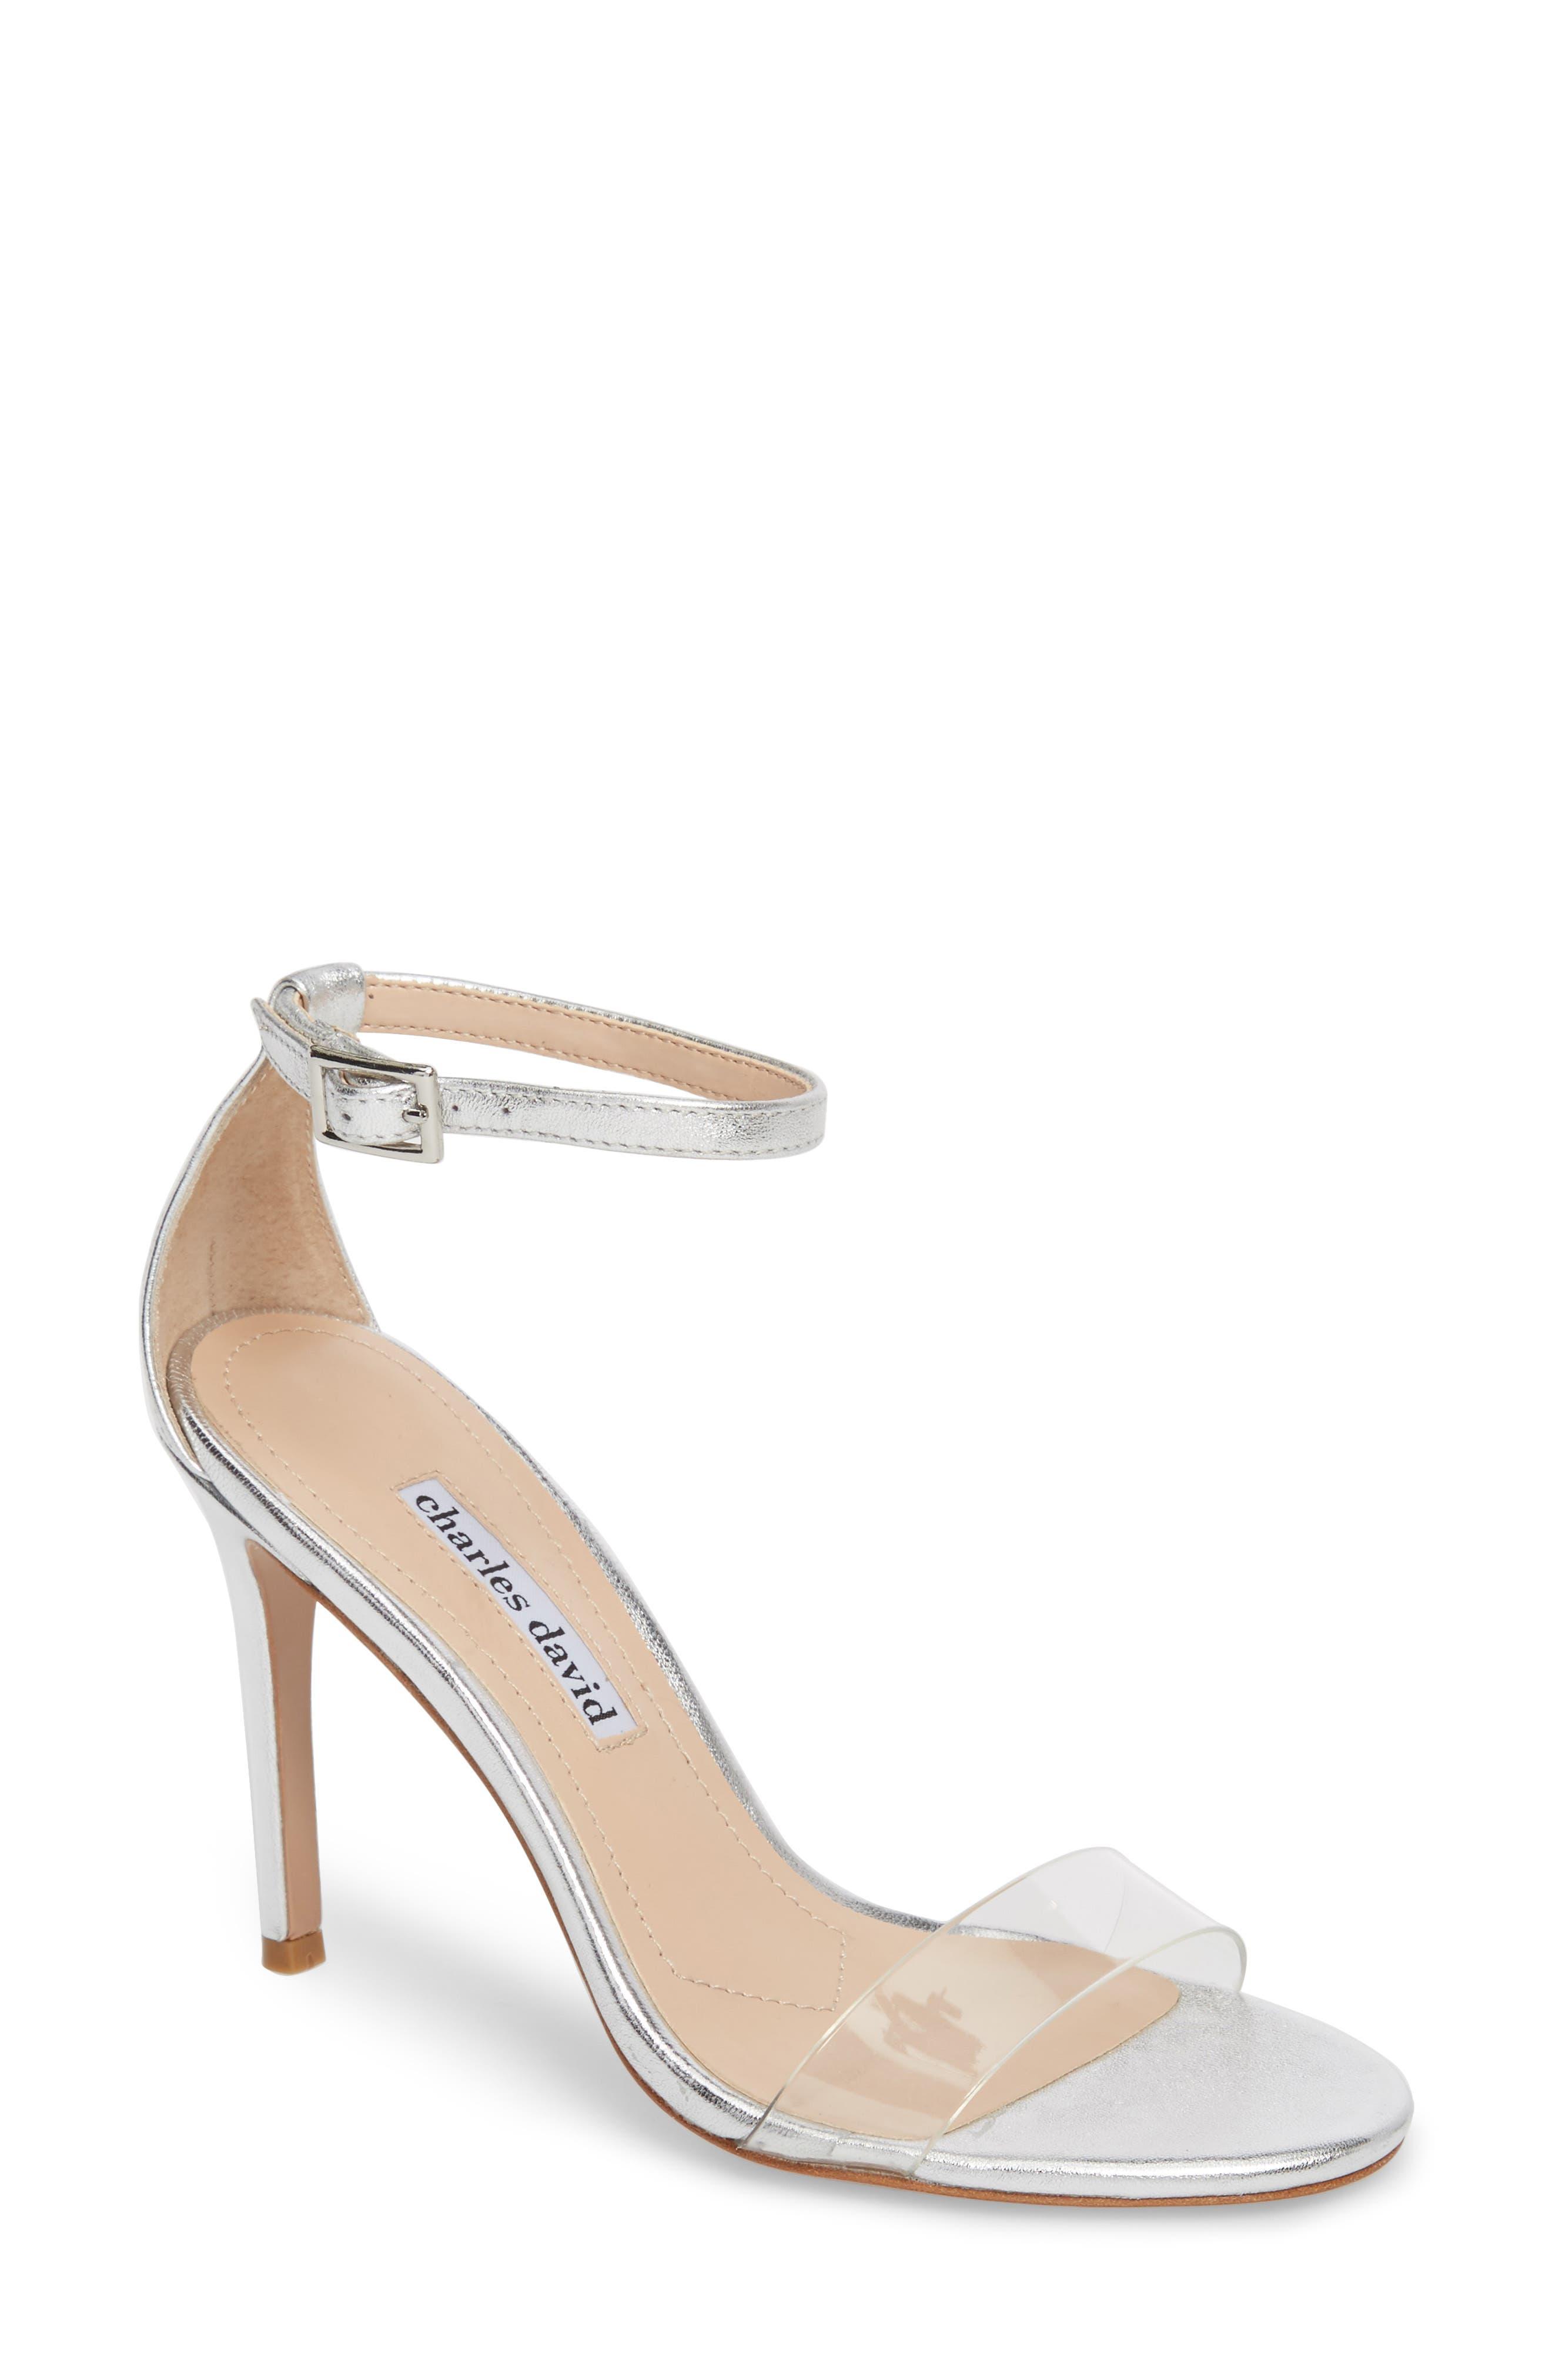 Cristal Sandal,                         Main,                         color, Silver Metallic Leather